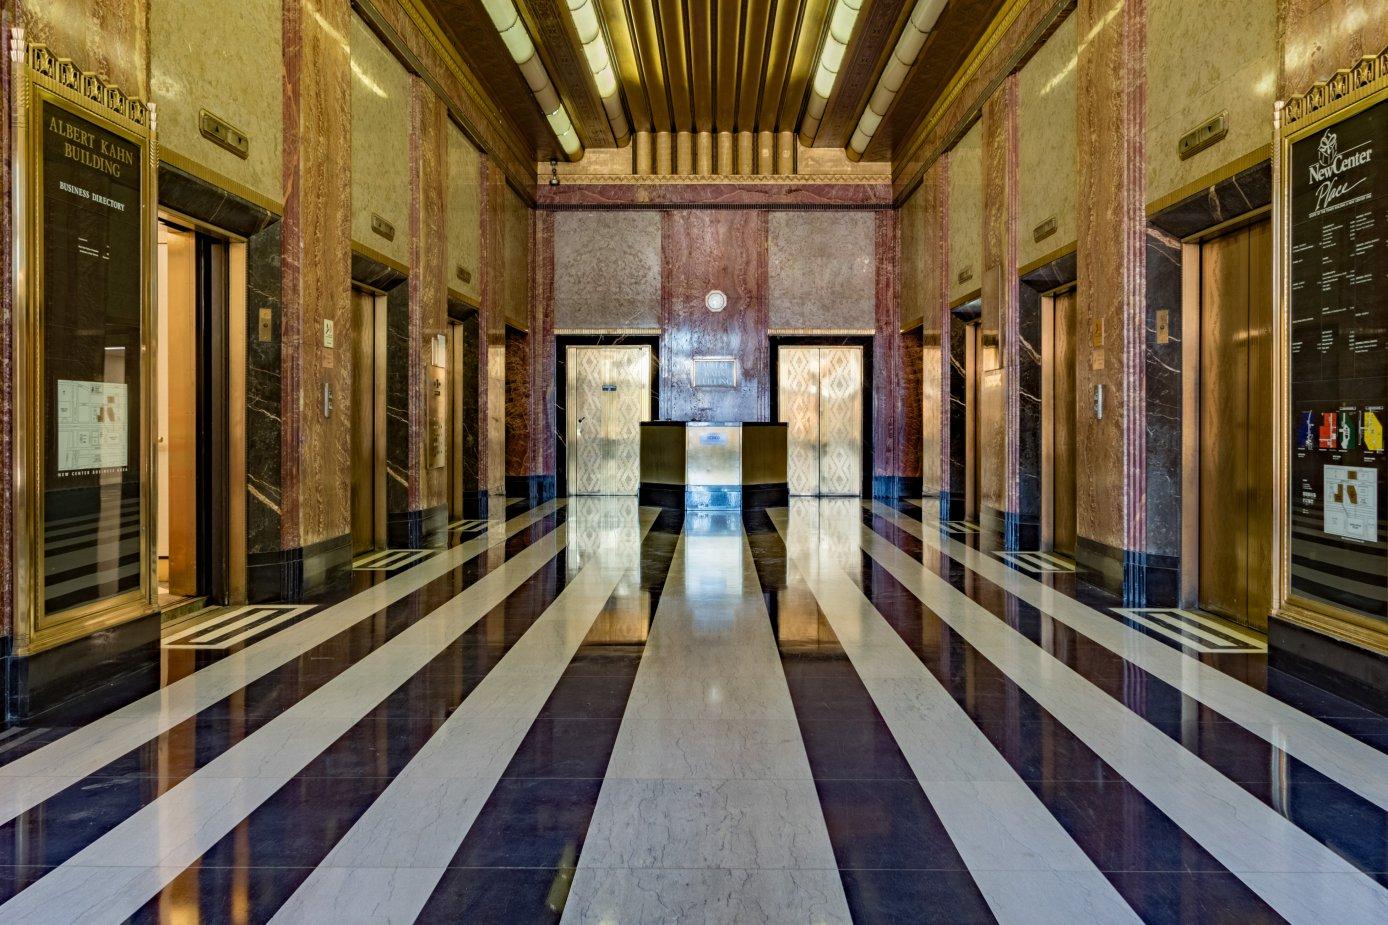 Historic Albert Kahn building sold | Lutz Financial Services